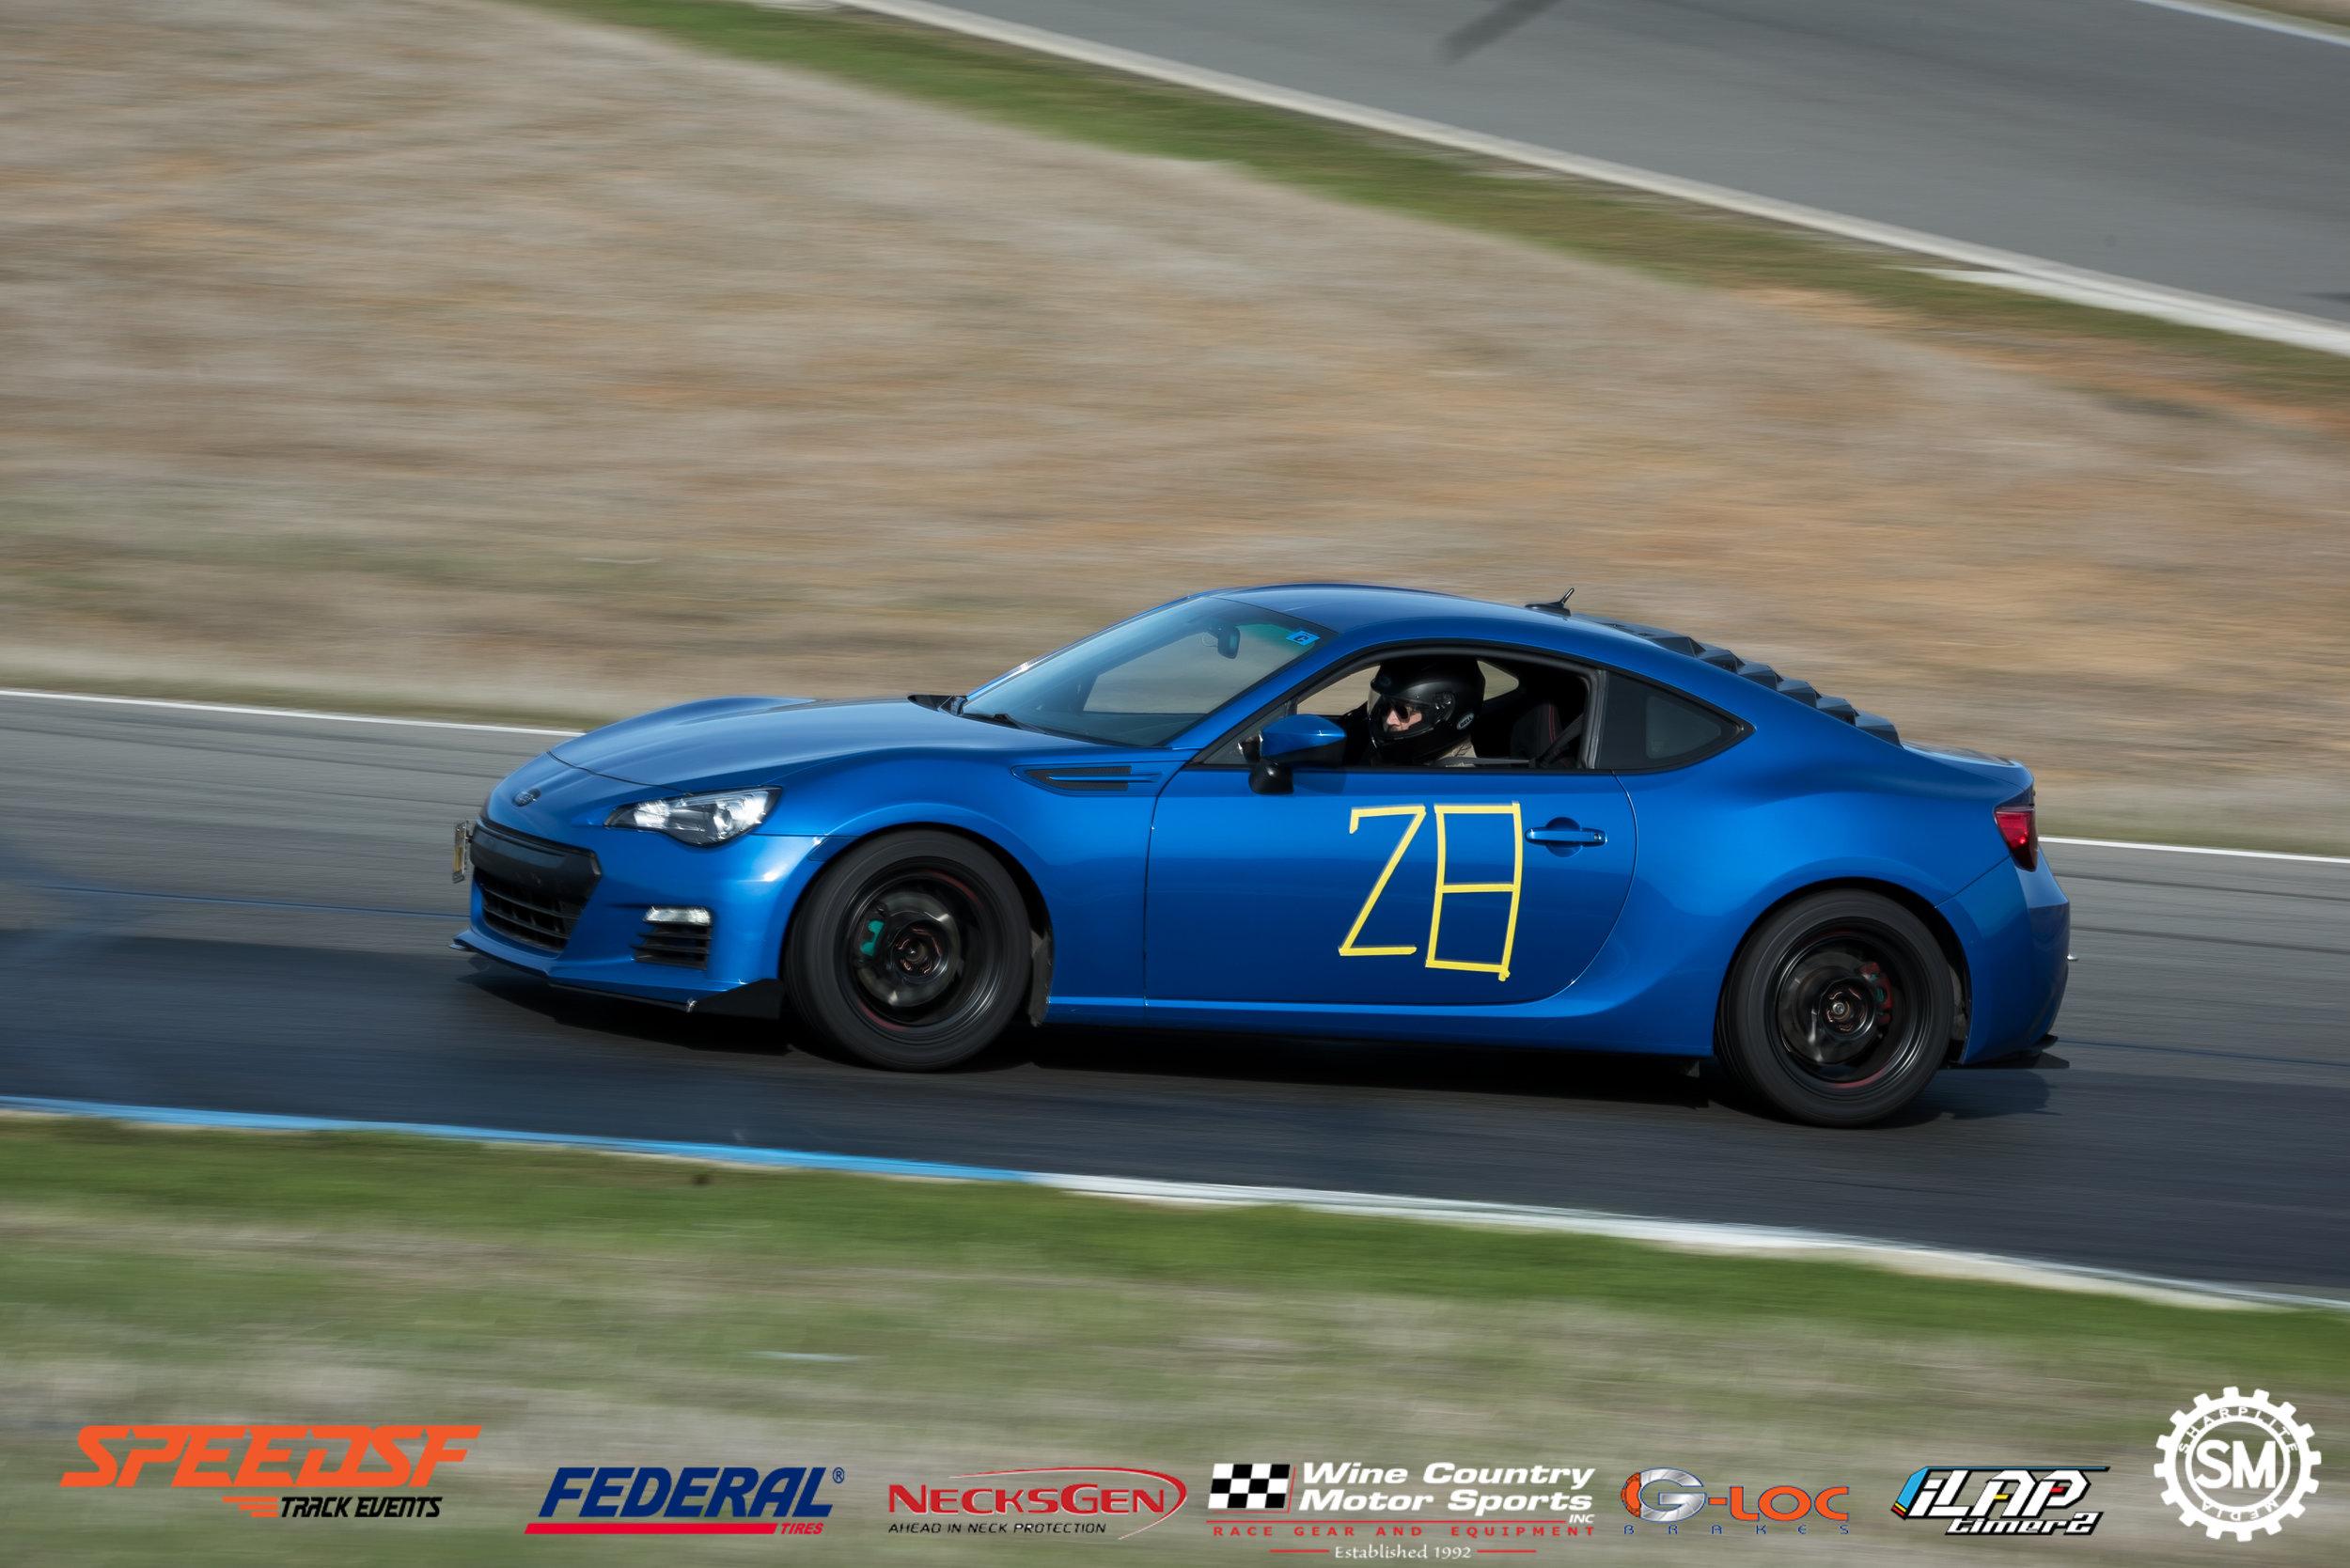 speedsf track saturday-1109.jpg